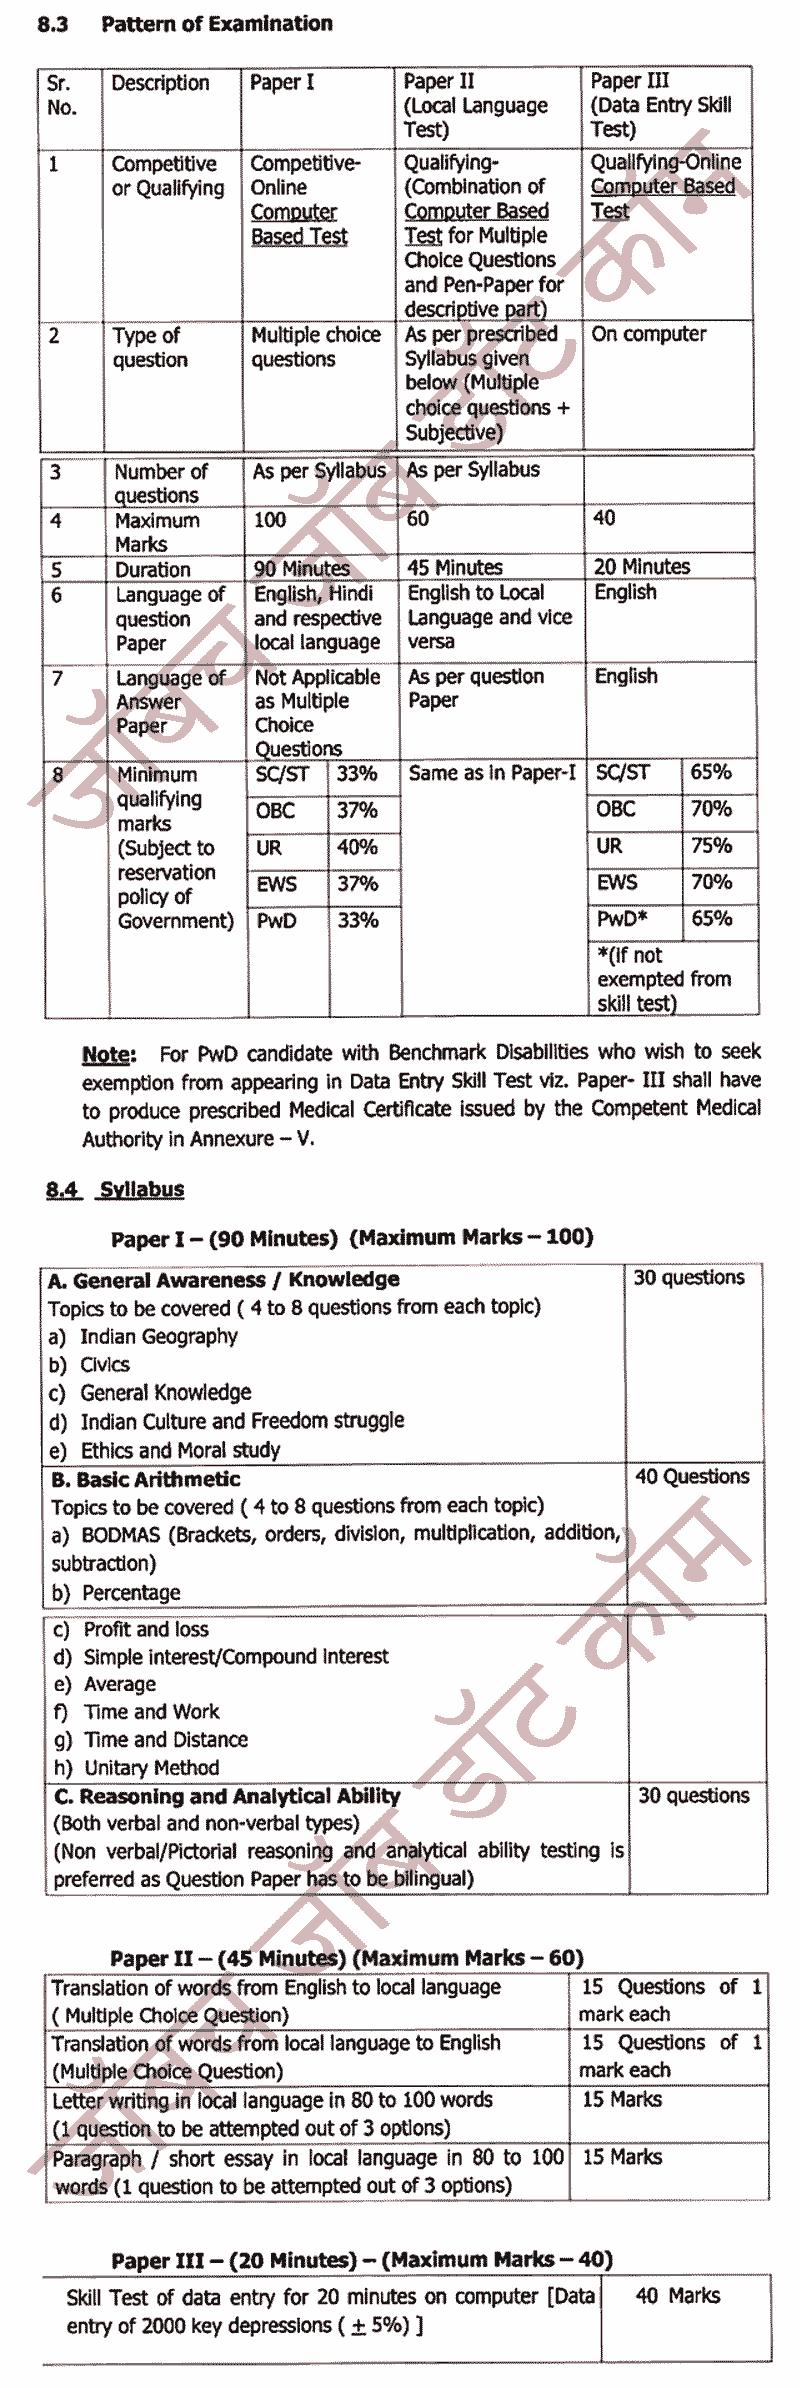 (Post Office) भारतीय डाक विभाग महाराष्ट्र सर्कल 1371 जागा भरती 2020 [Admit Card Dwonload] 4